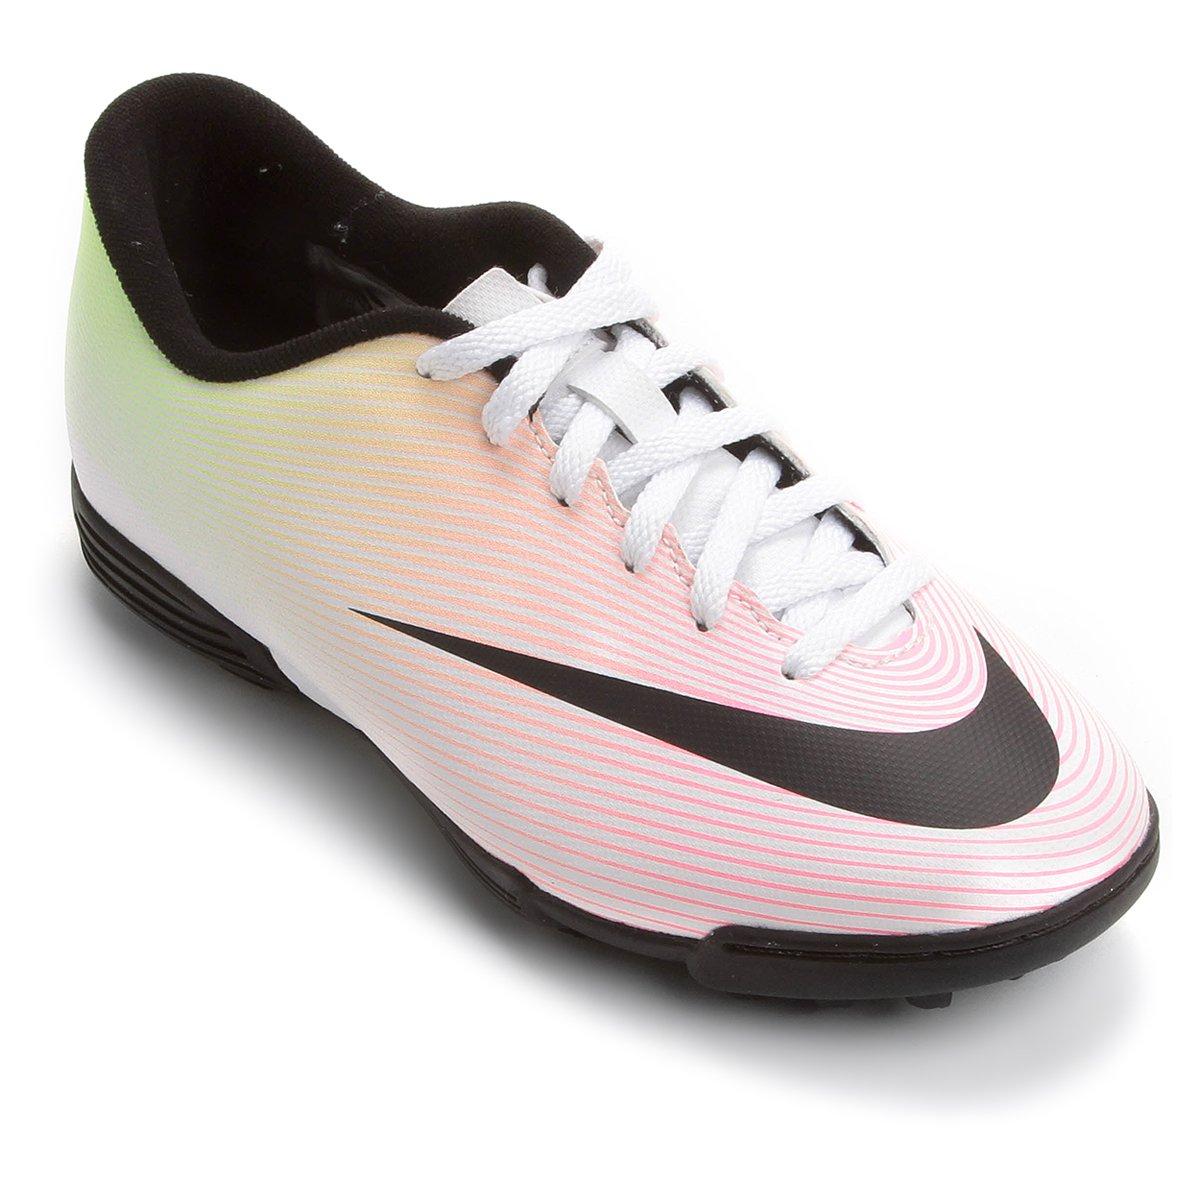 225aa6c1dc Chuteira Nike Mercurial Vortex 2 TF Society Infantil - Compre Agora ...